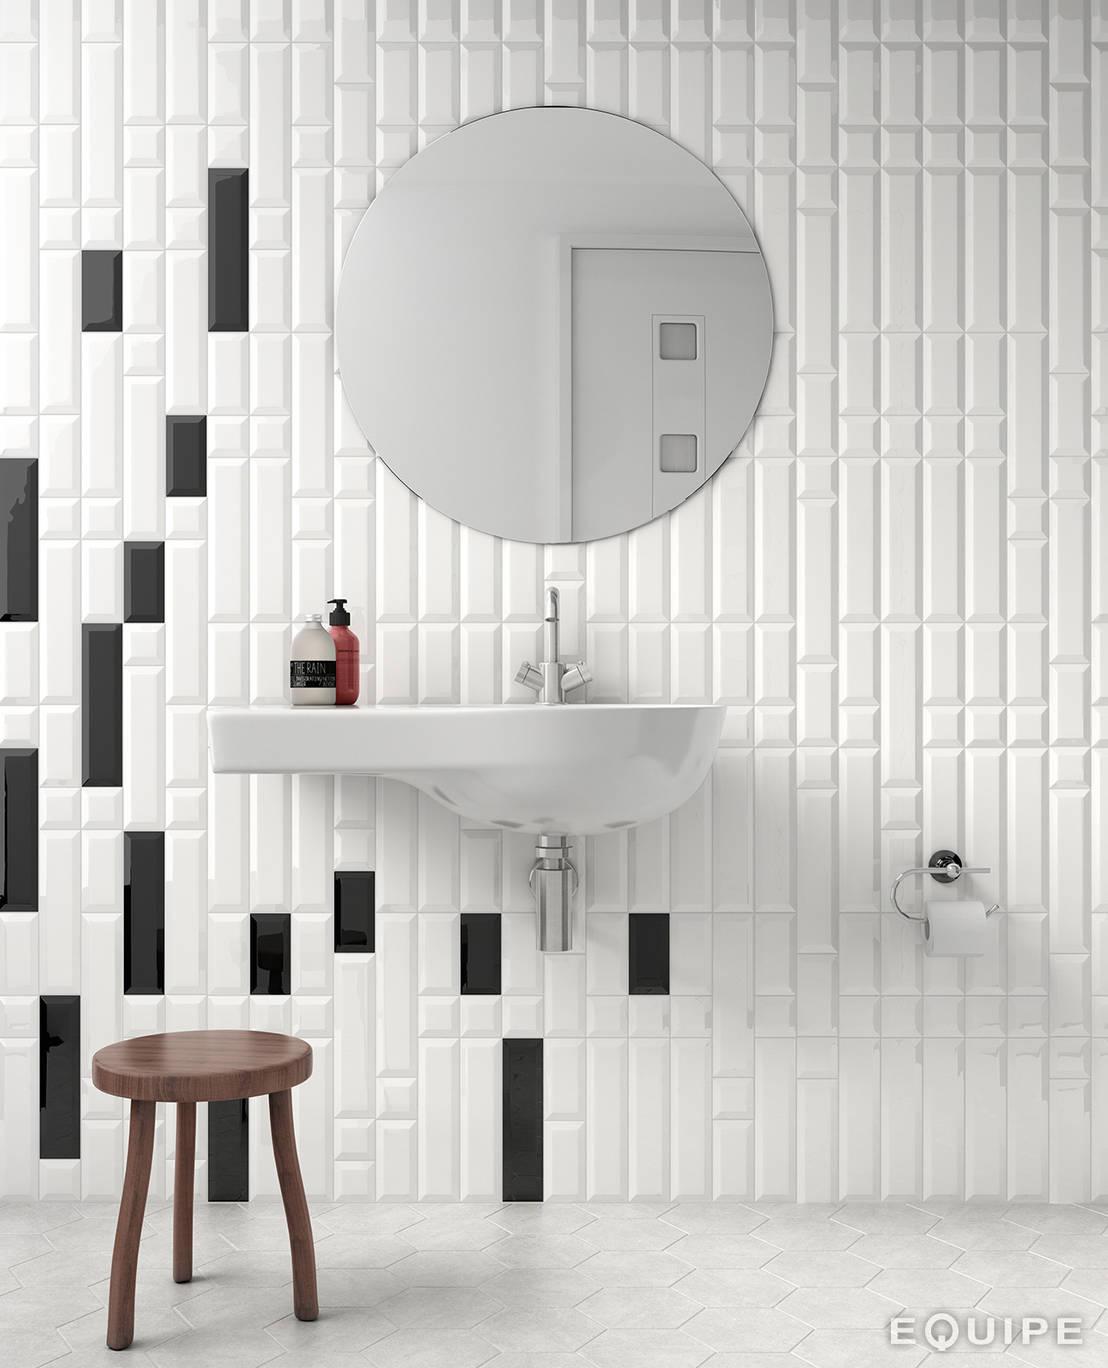 metro de equipe ceramicas homify. Black Bedroom Furniture Sets. Home Design Ideas